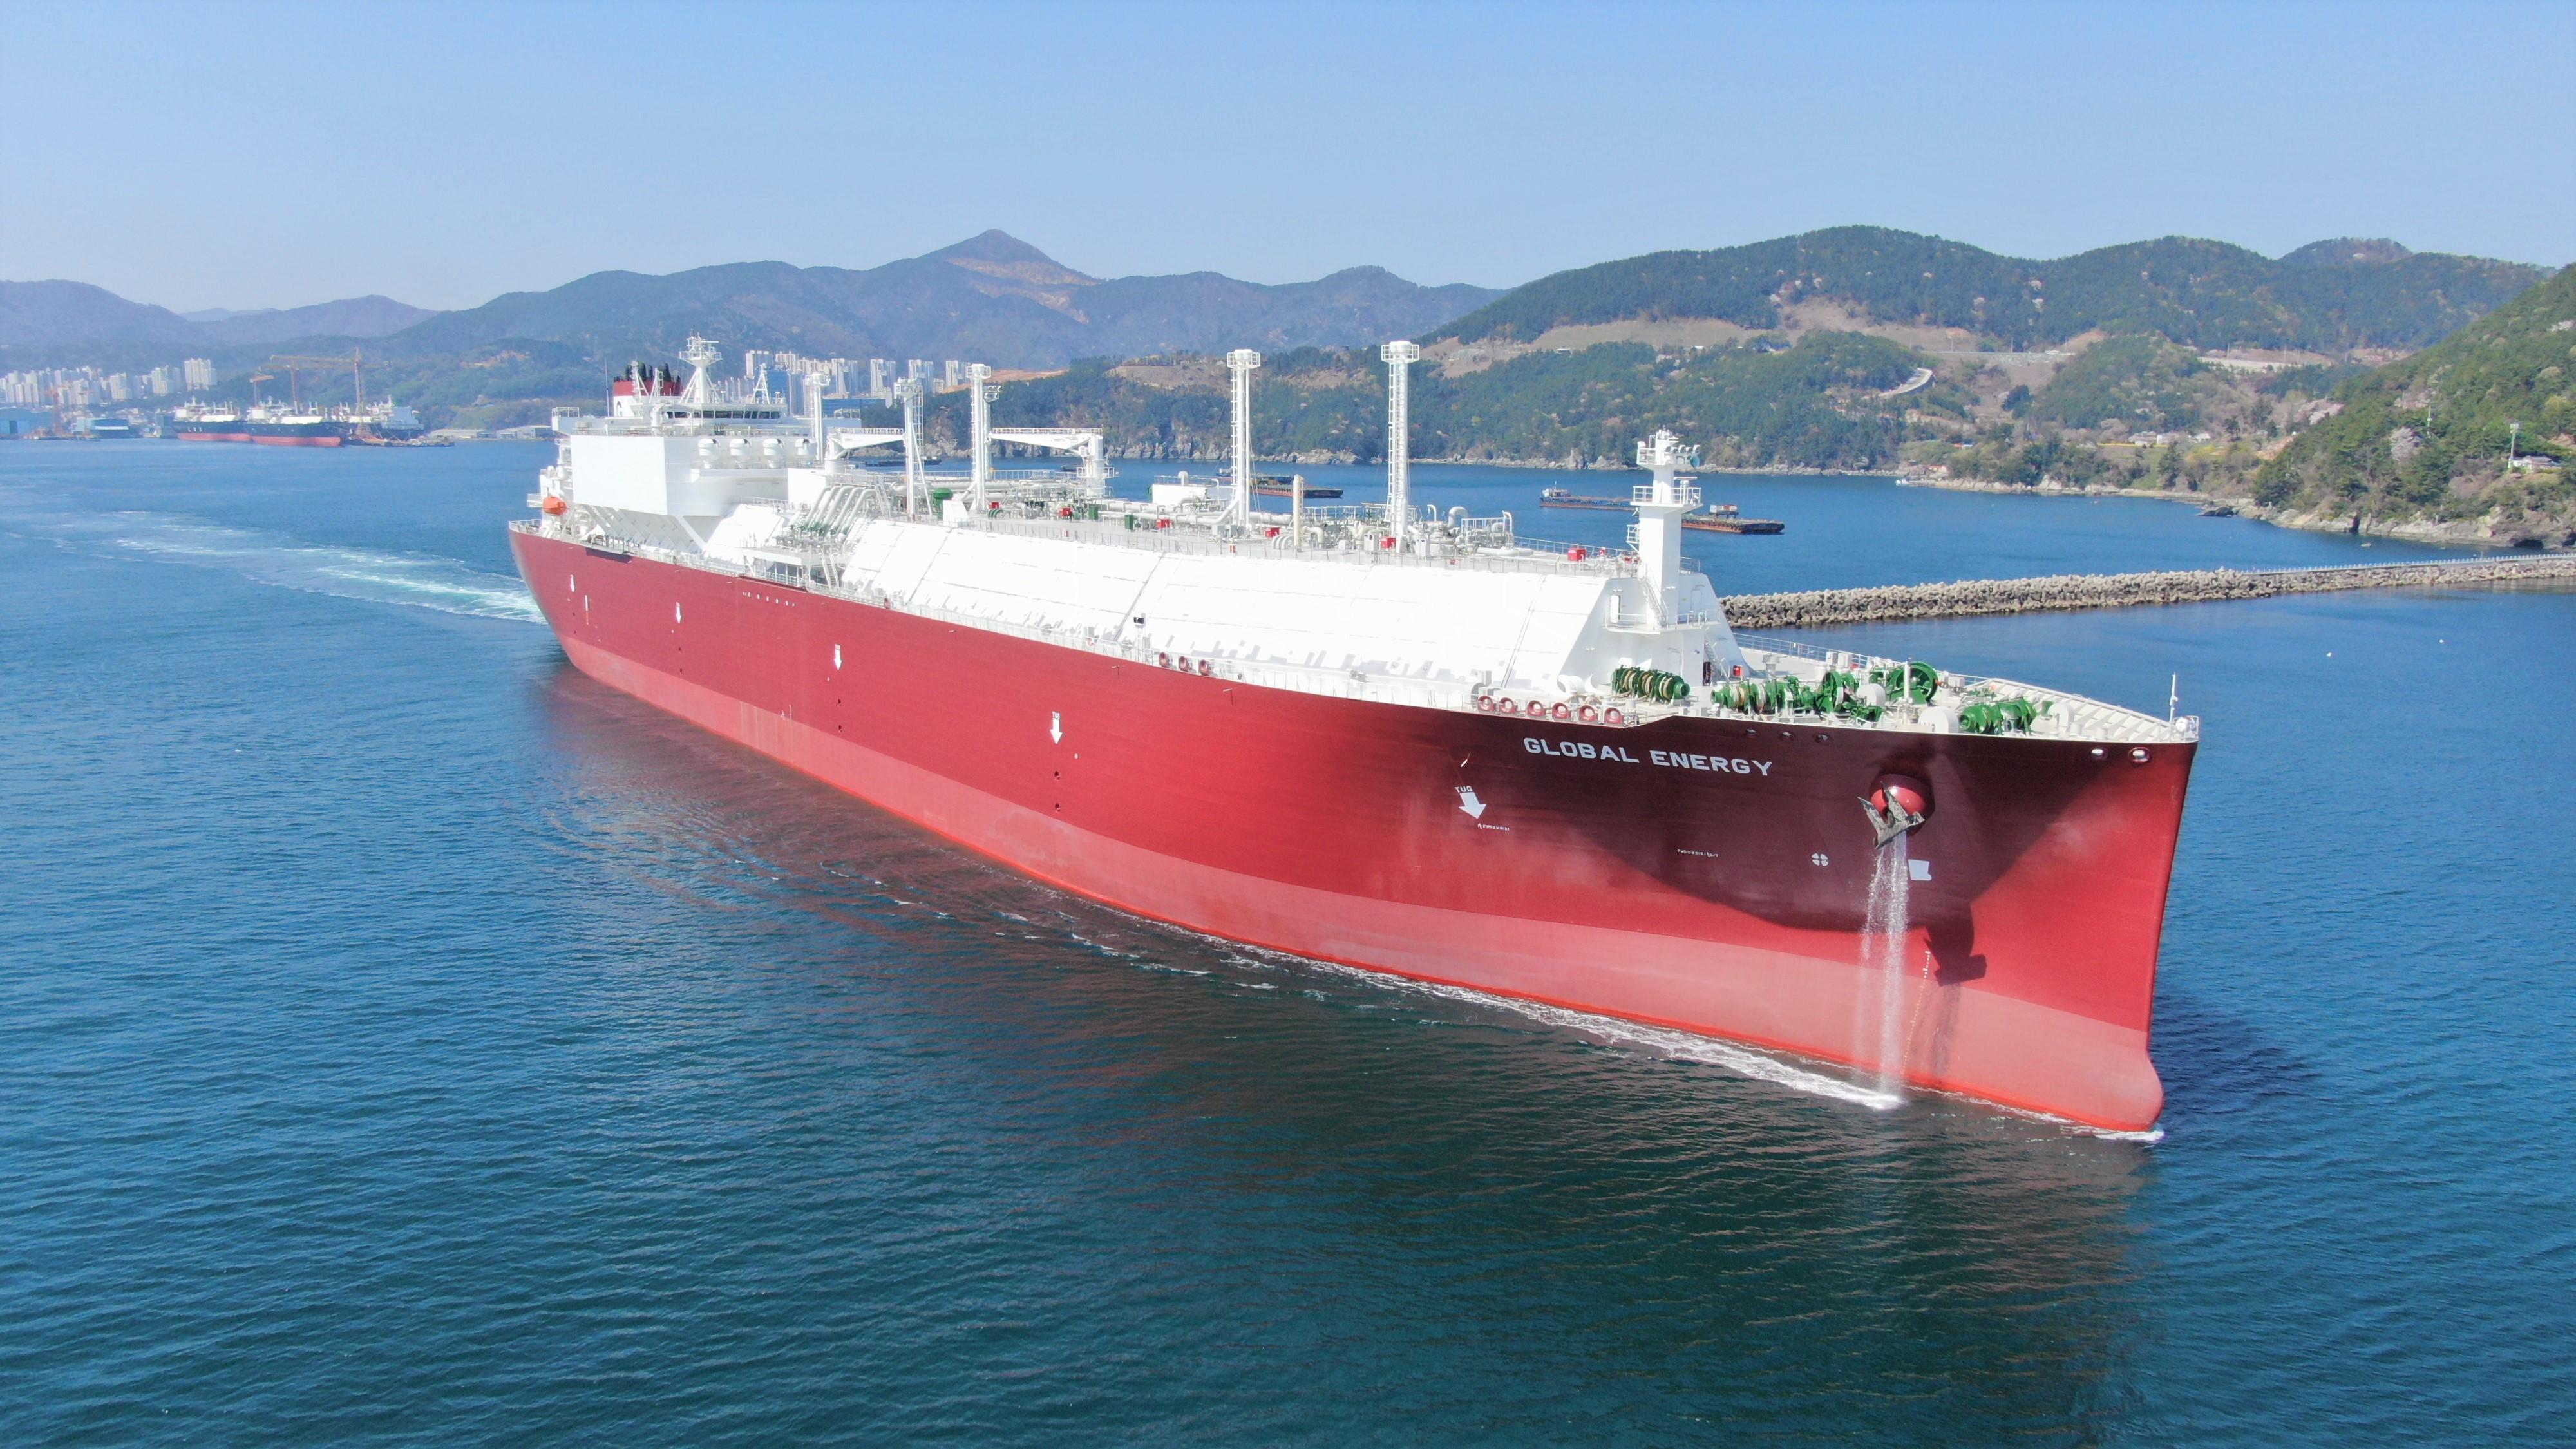 Nakilat-Maran Gas JV takes delivery of LNG newbuild